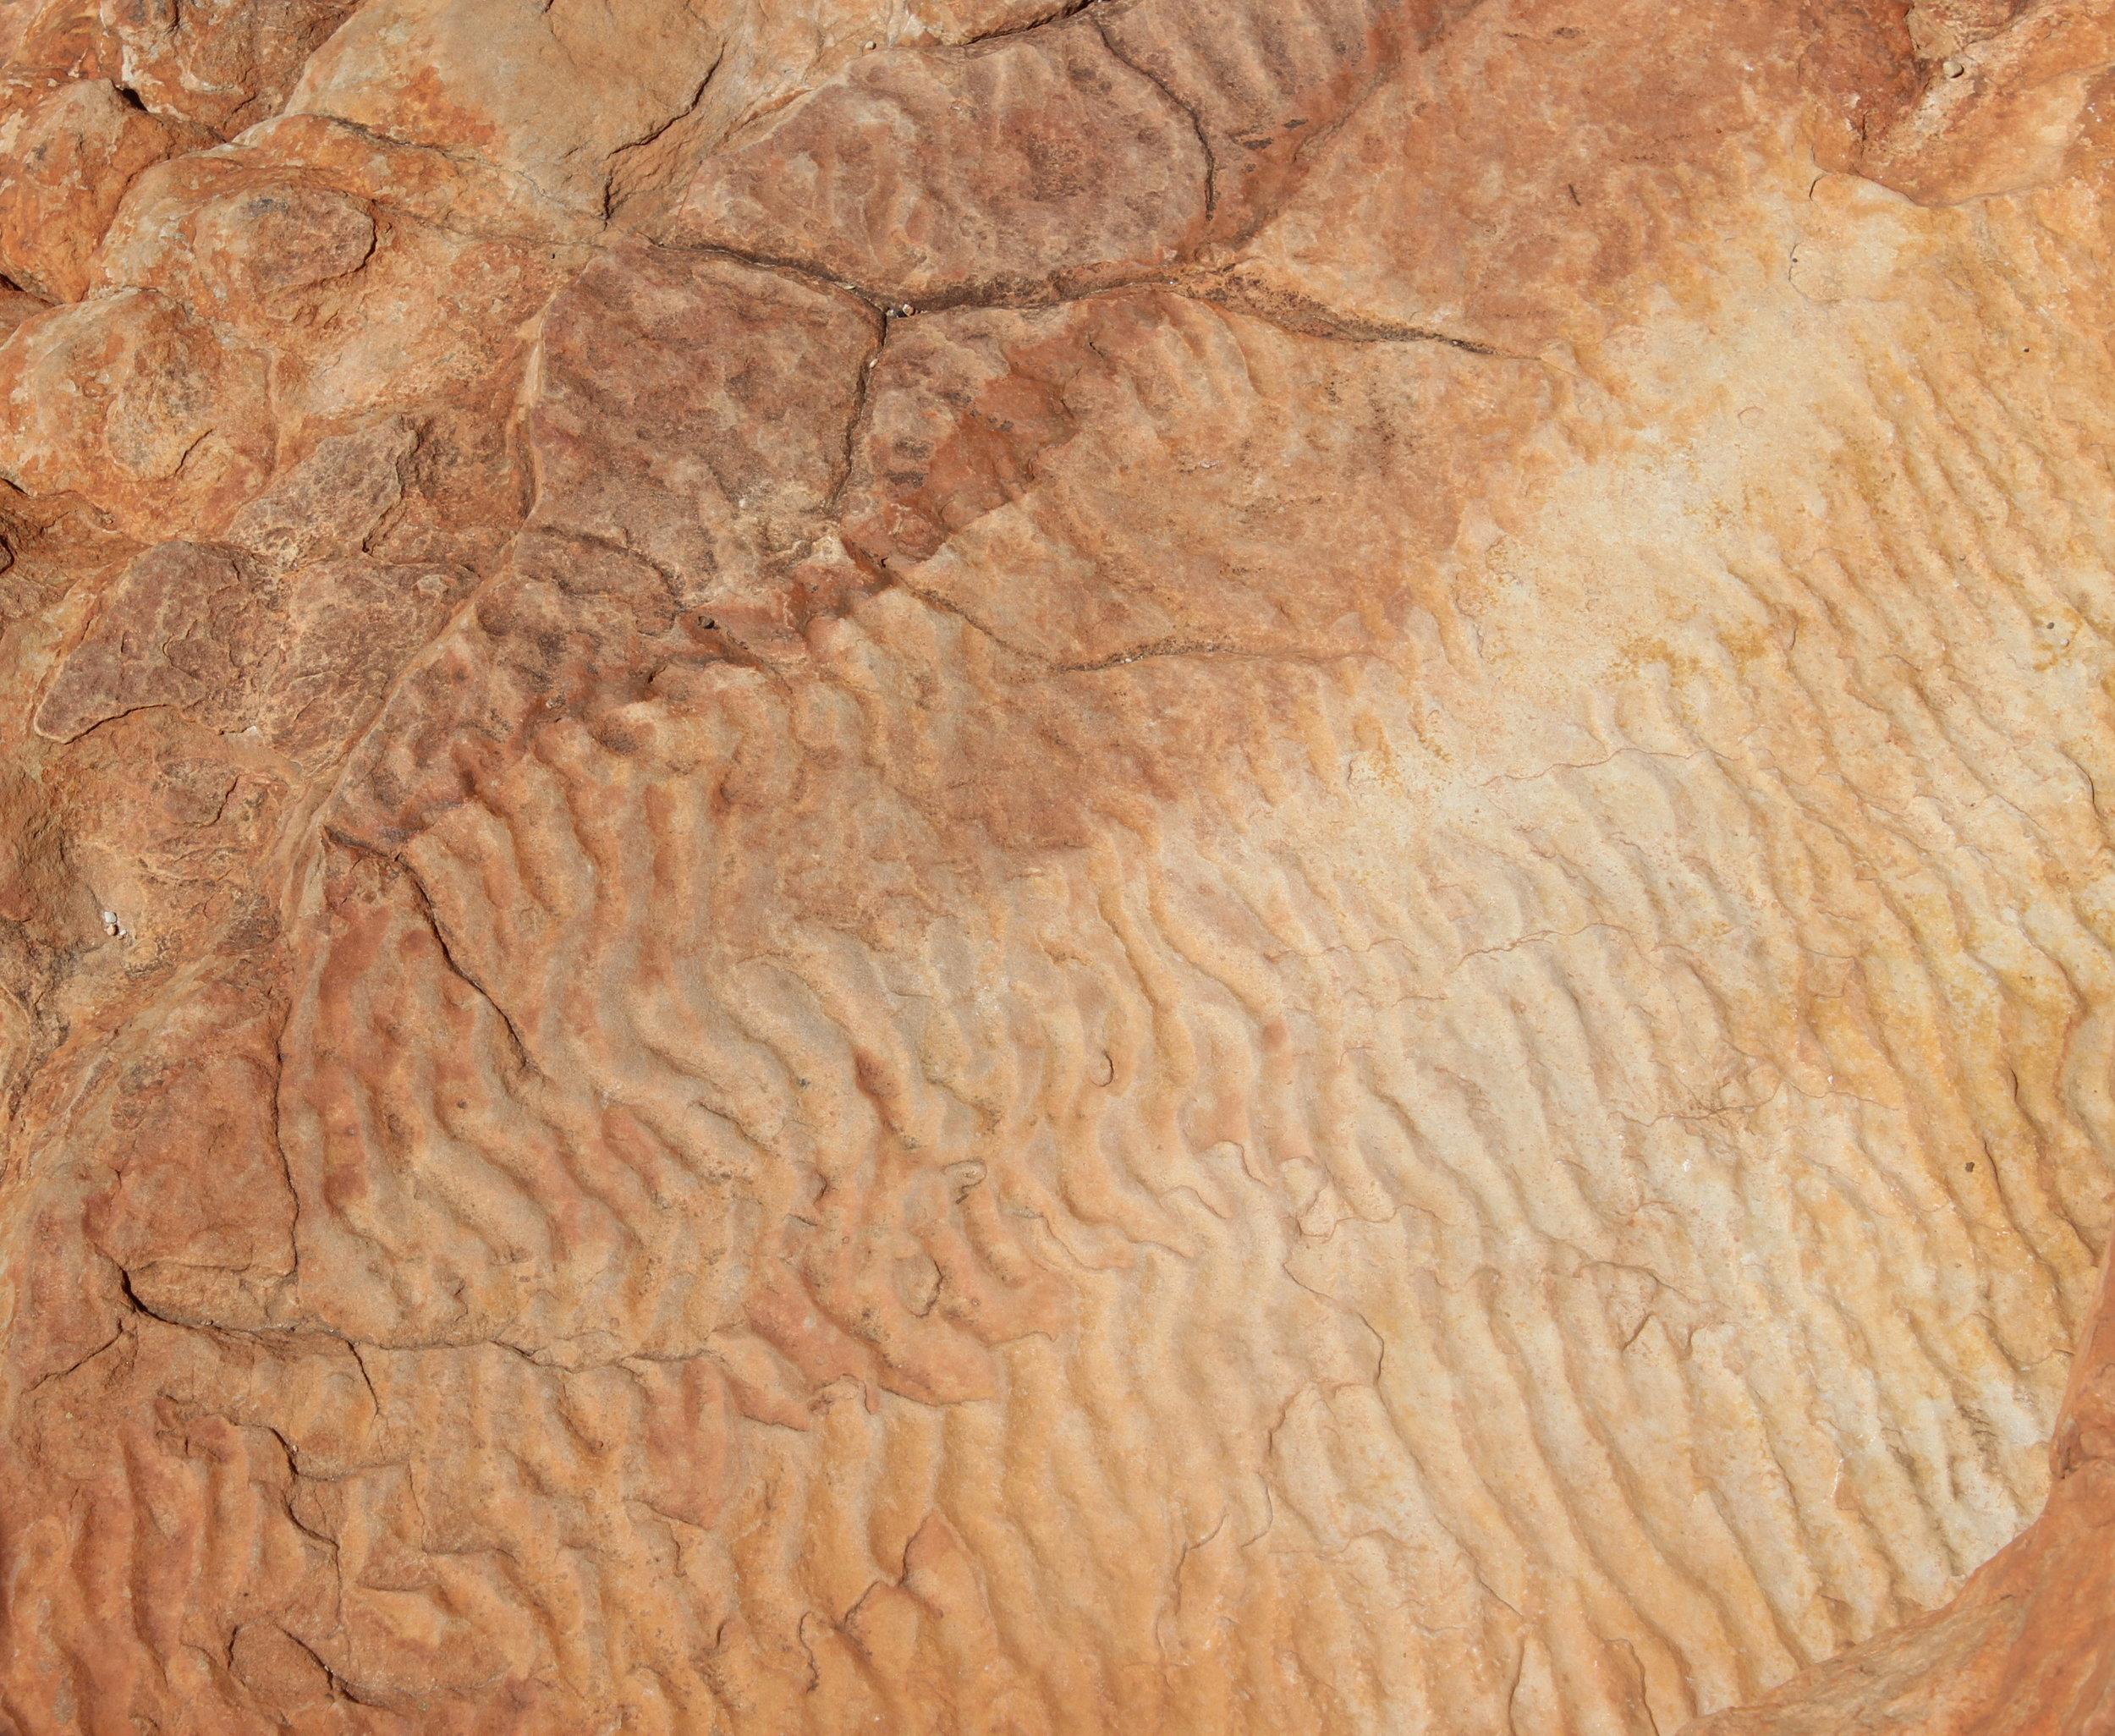 Tidal mark, Kings Canyon inside Watarrka National Park, Northern Territory, Australia.